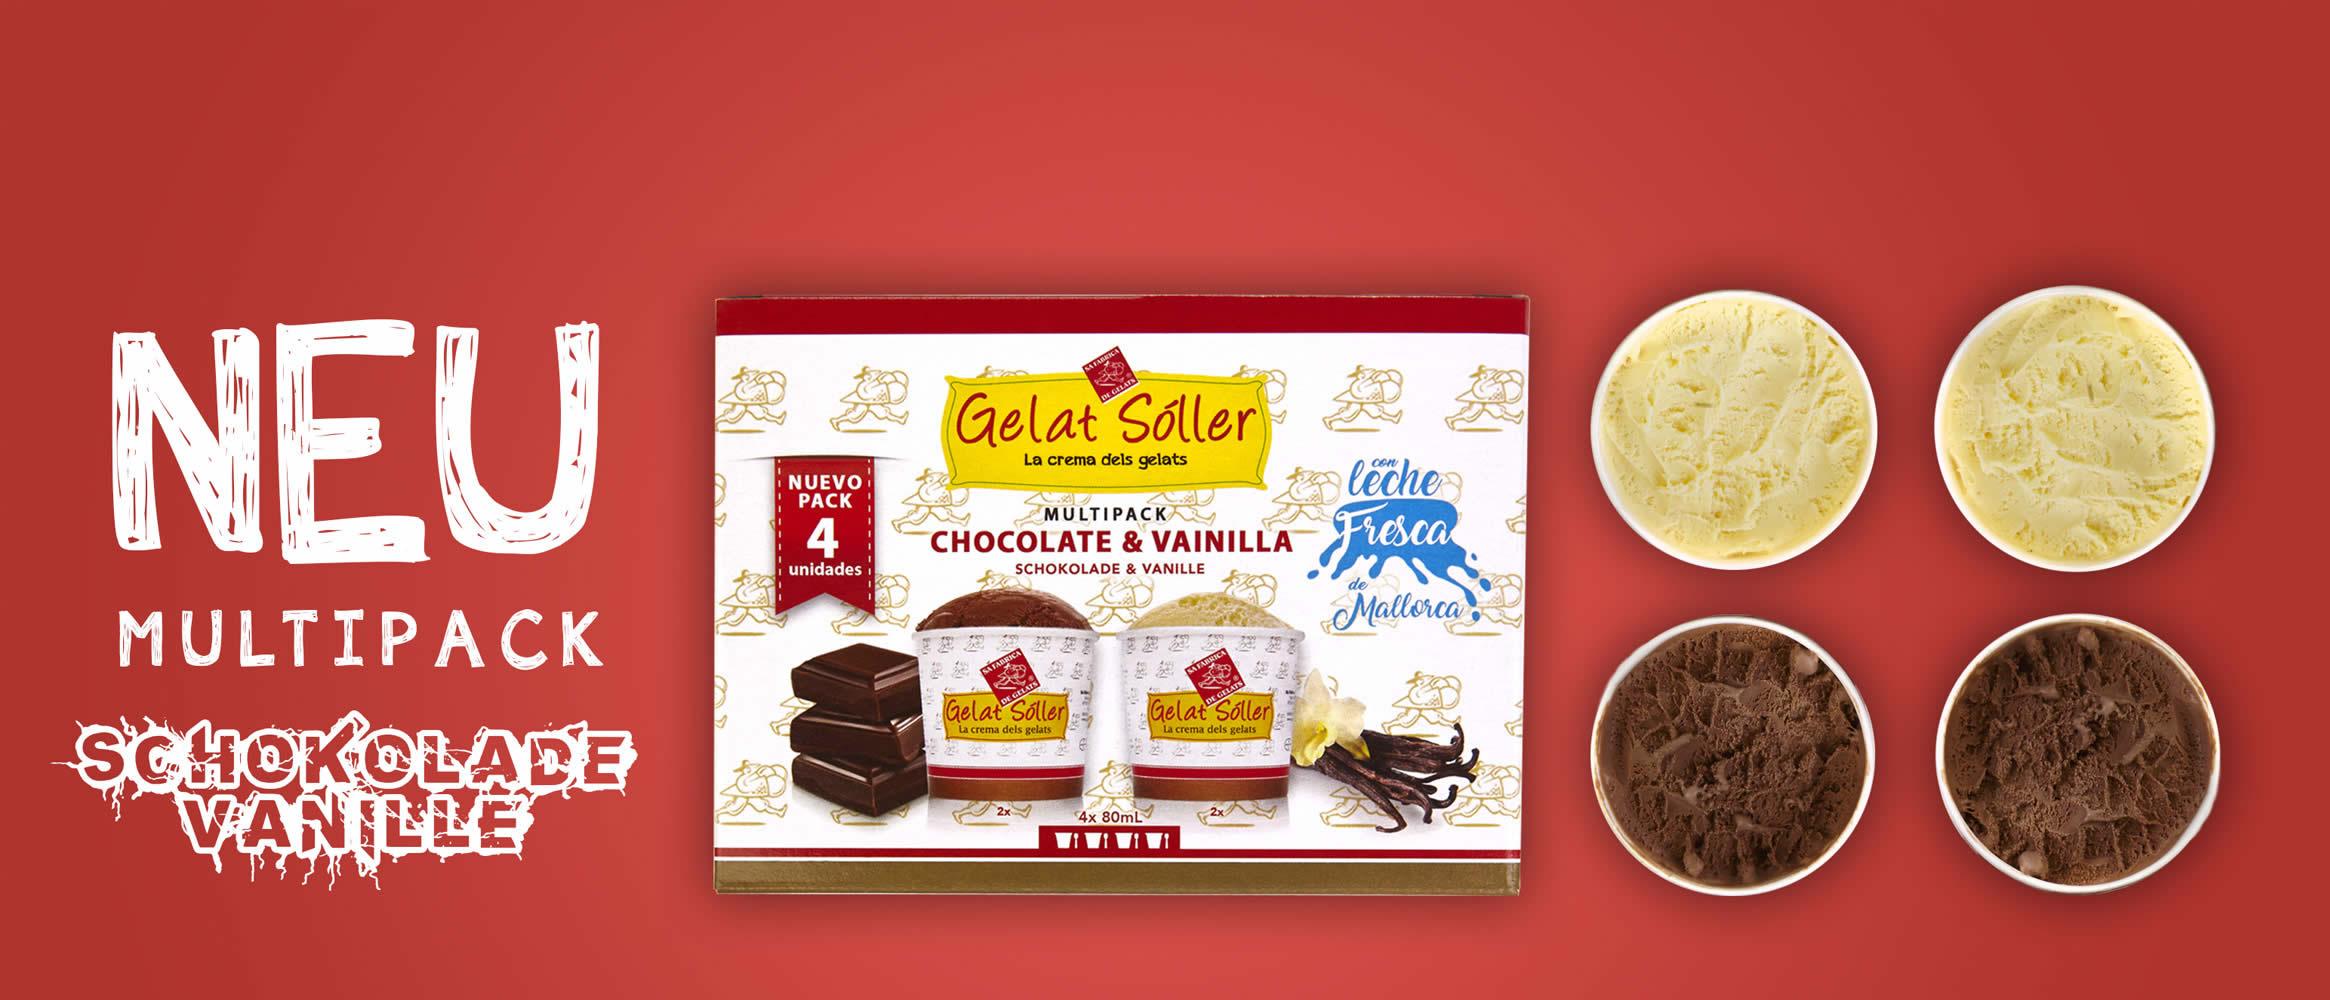 Multipack - Chocolate+vanilla 4x80ml Gelat Sóller